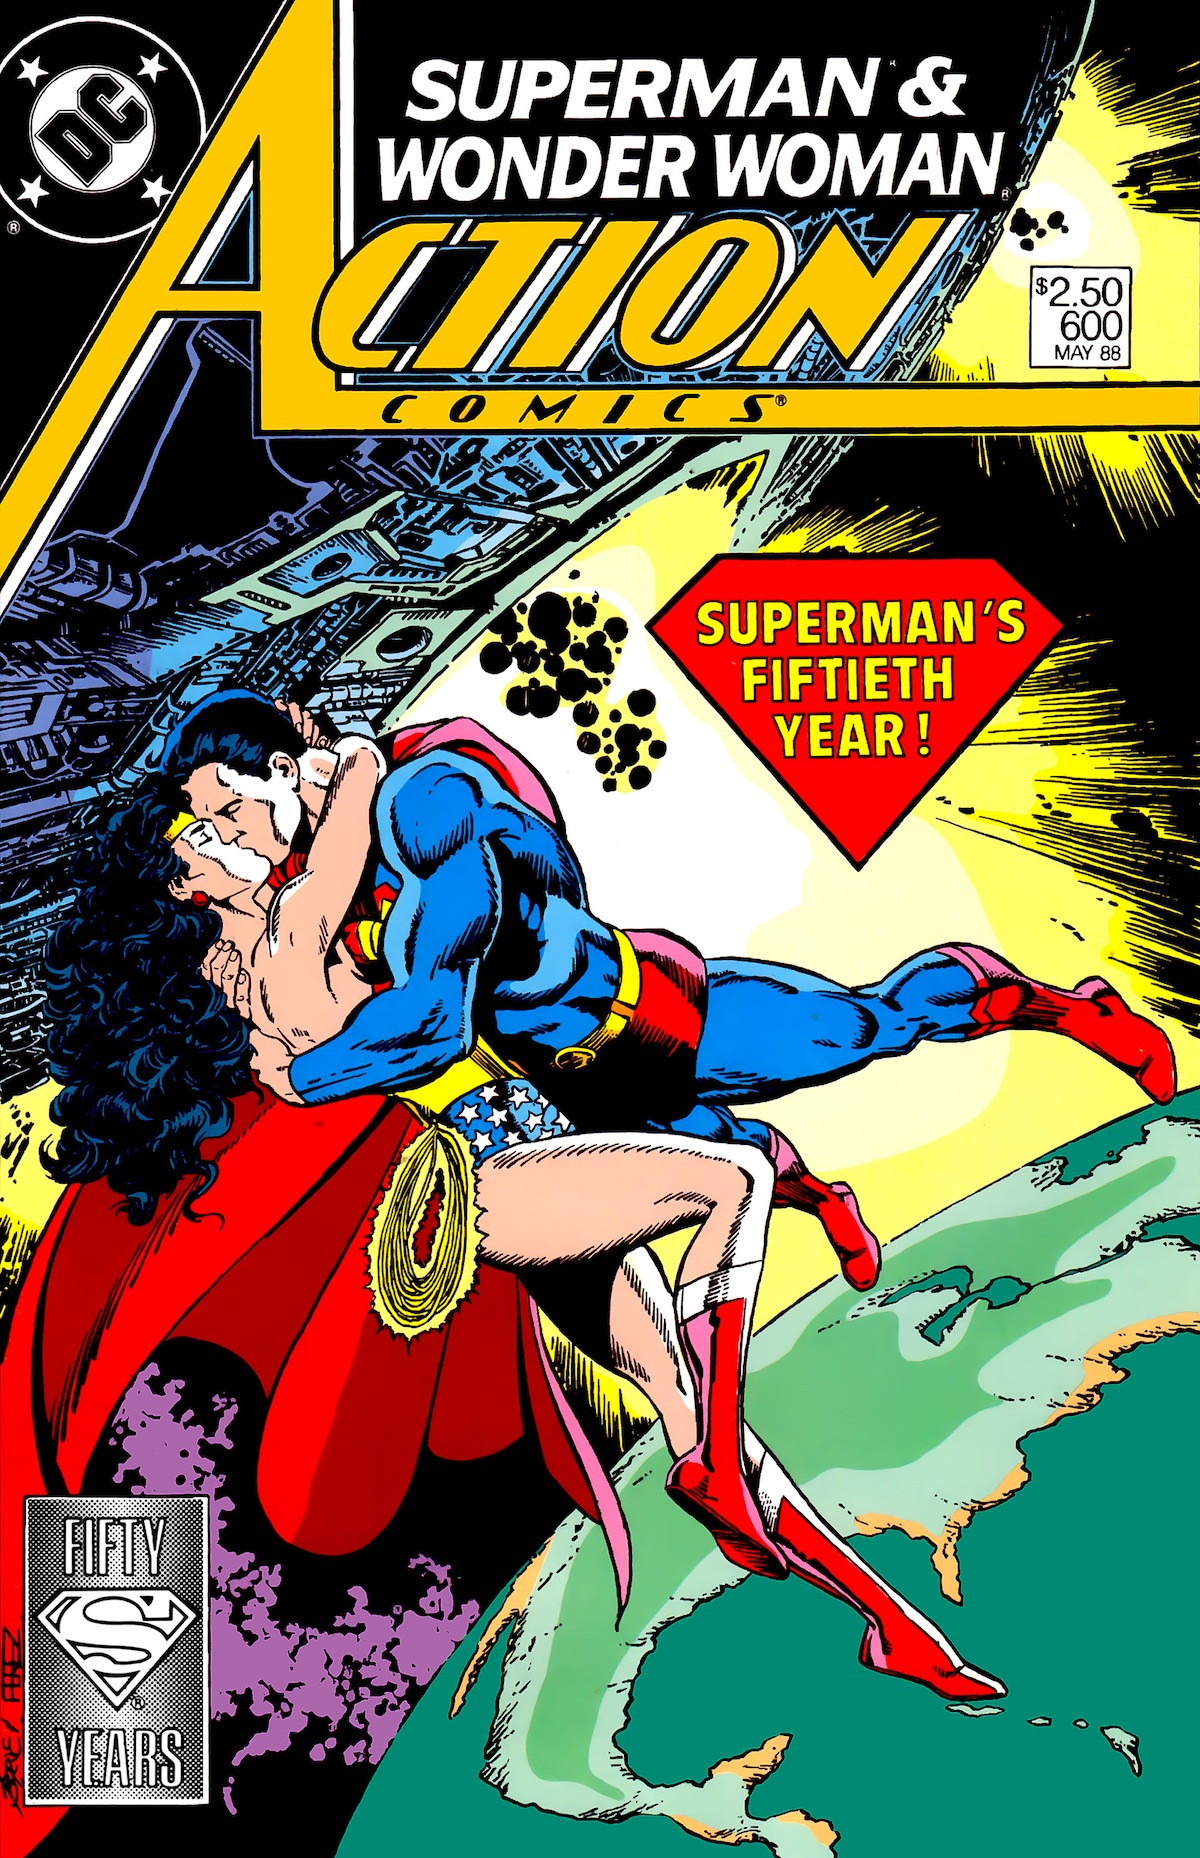 Action Comics #600 Variant